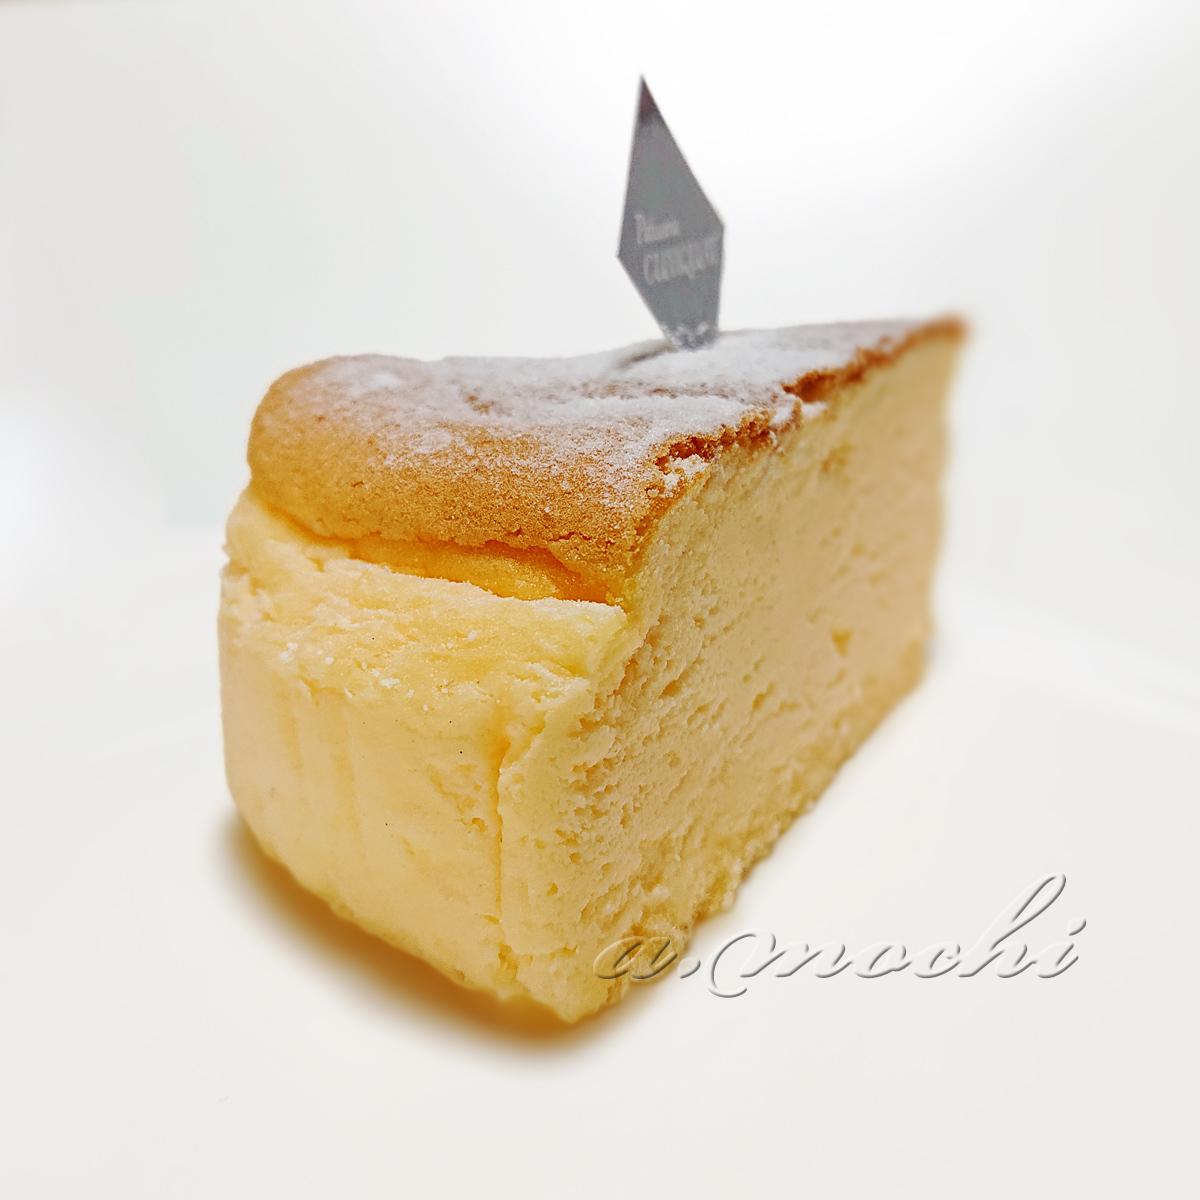 2_comquatyama3_cheese.jpg